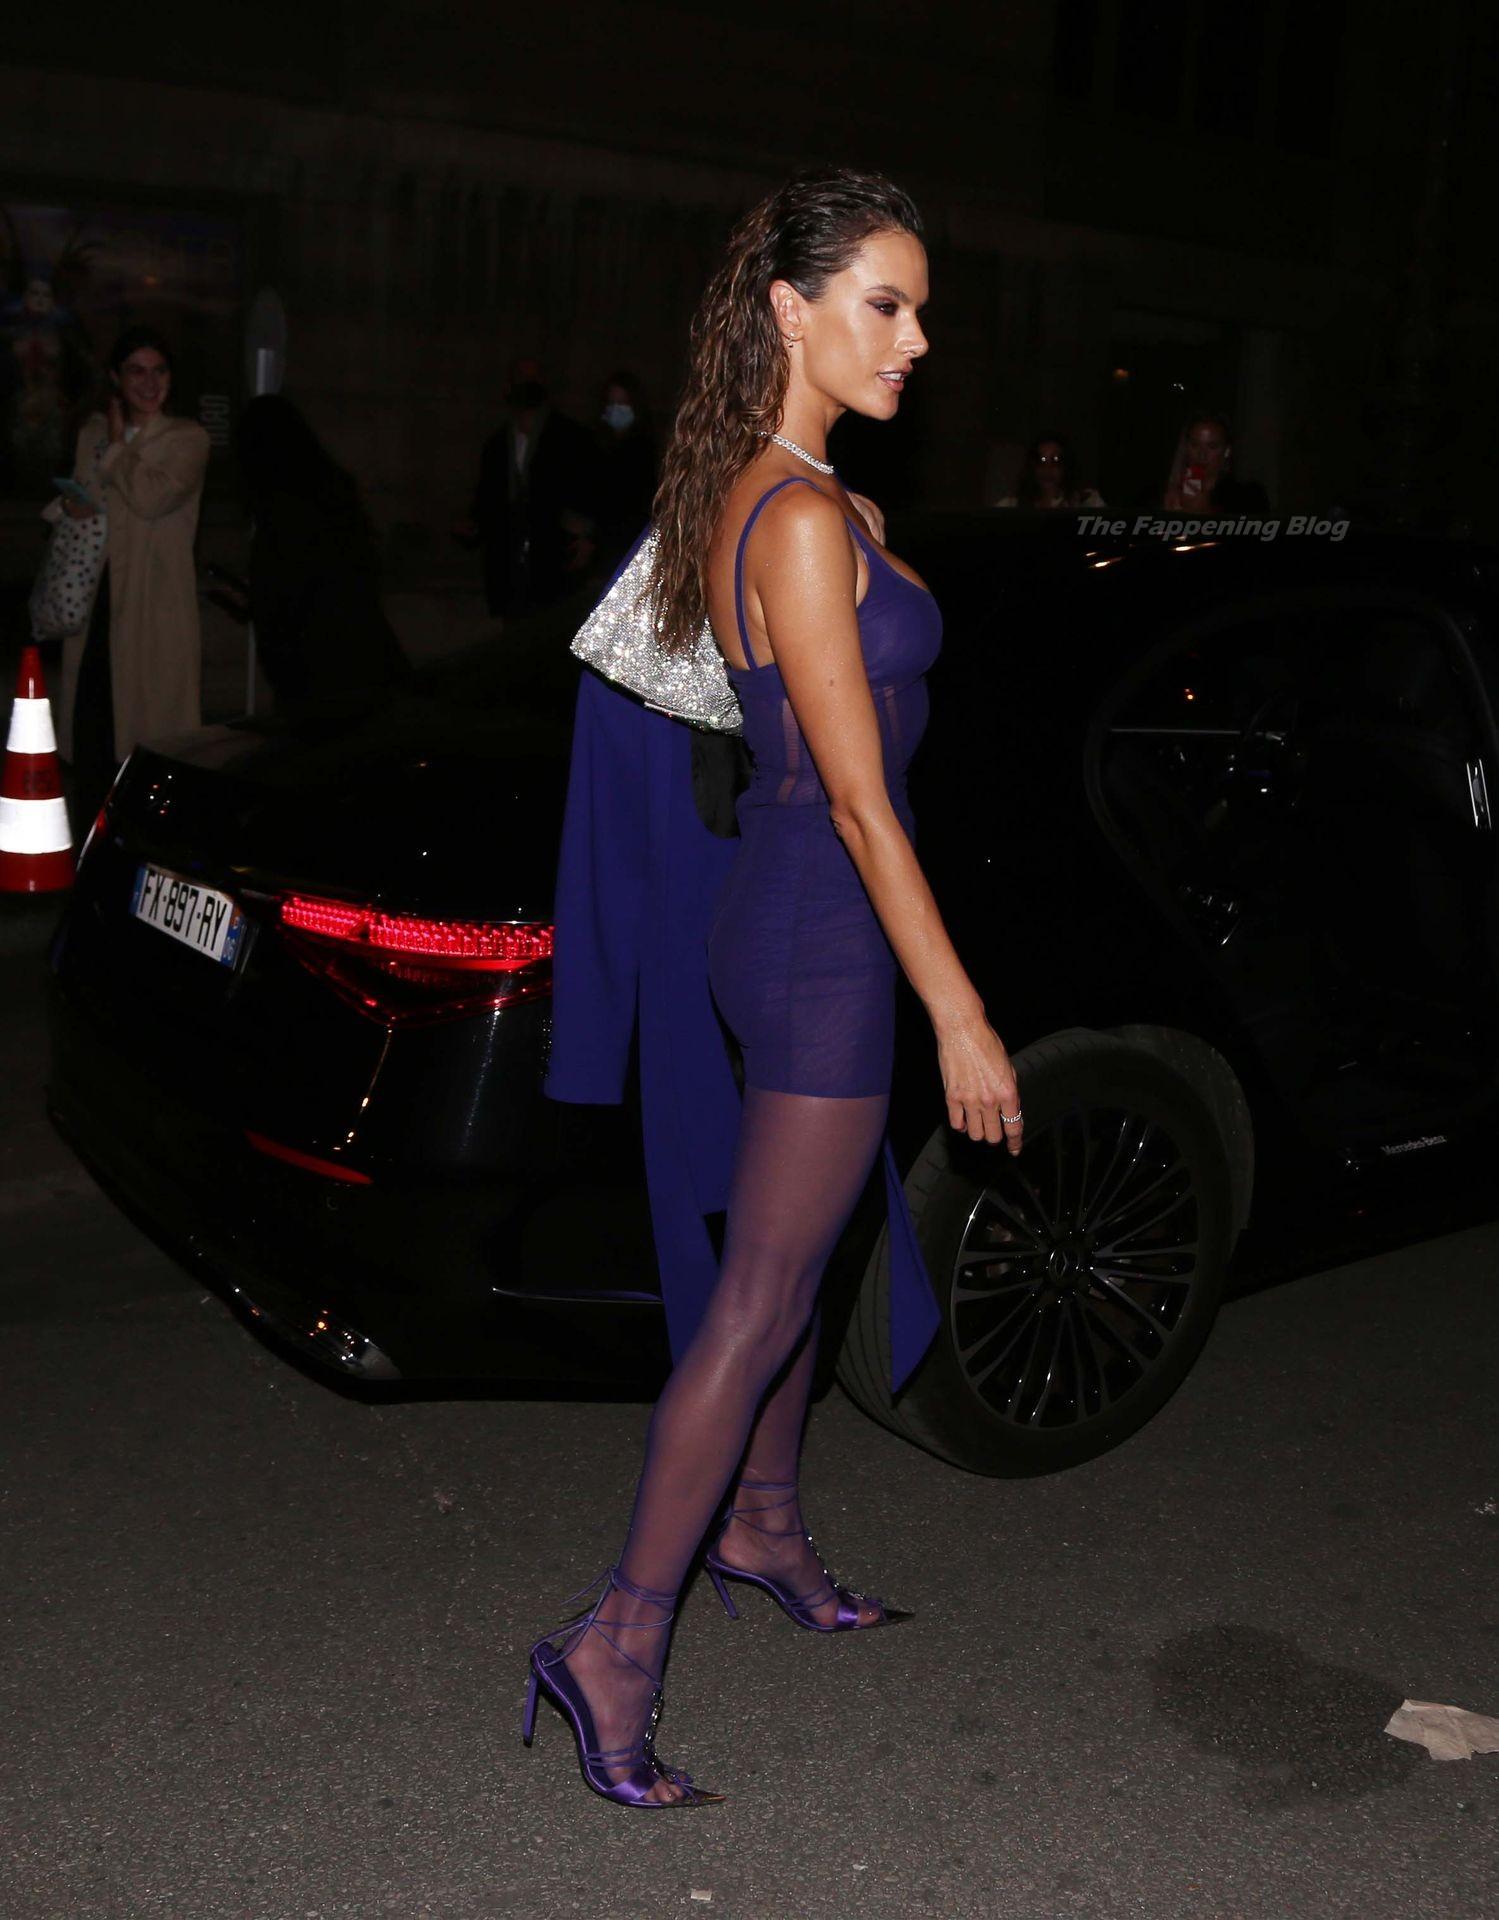 Alessandra-Ambrosio-Sexy-The-Fappening-Blog-43-1.jpg